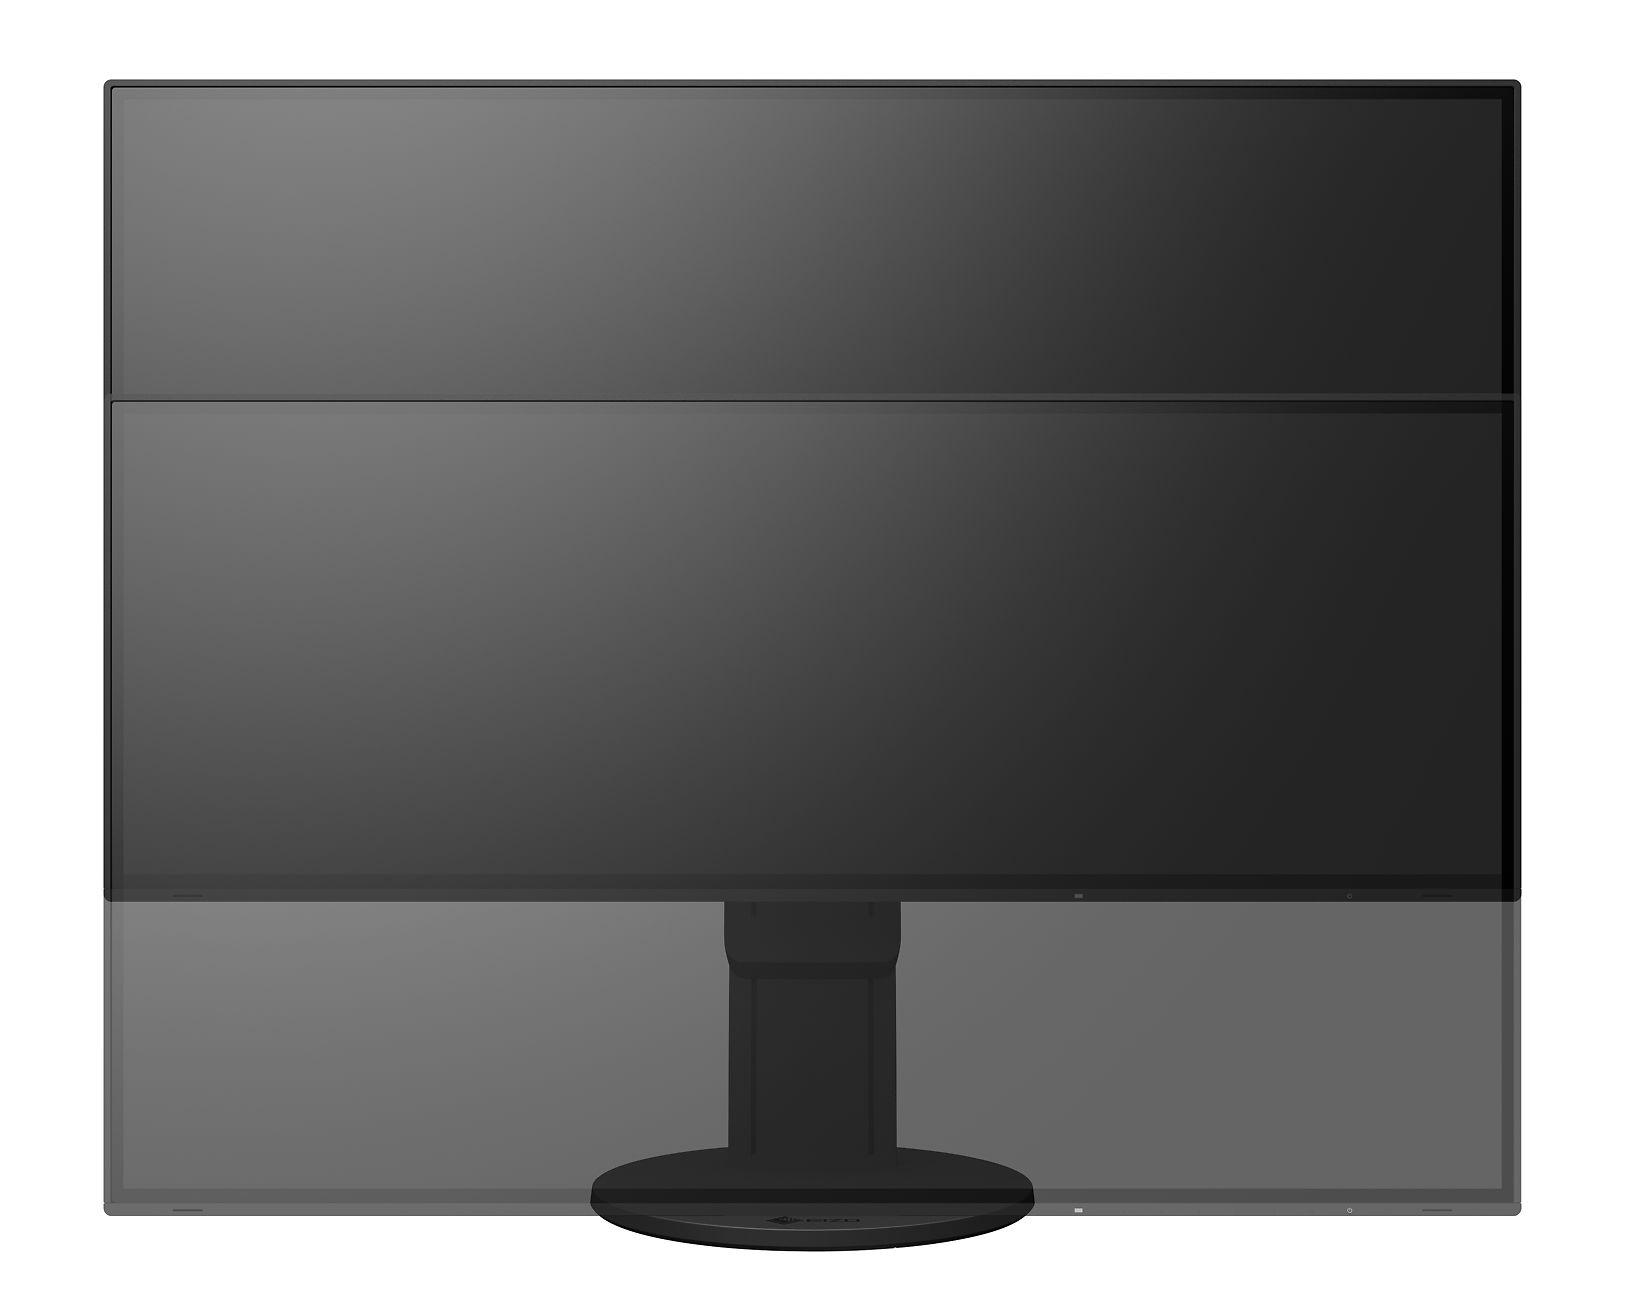 "Eizo Flexscan EV3285 31.5"" Monitor Image"